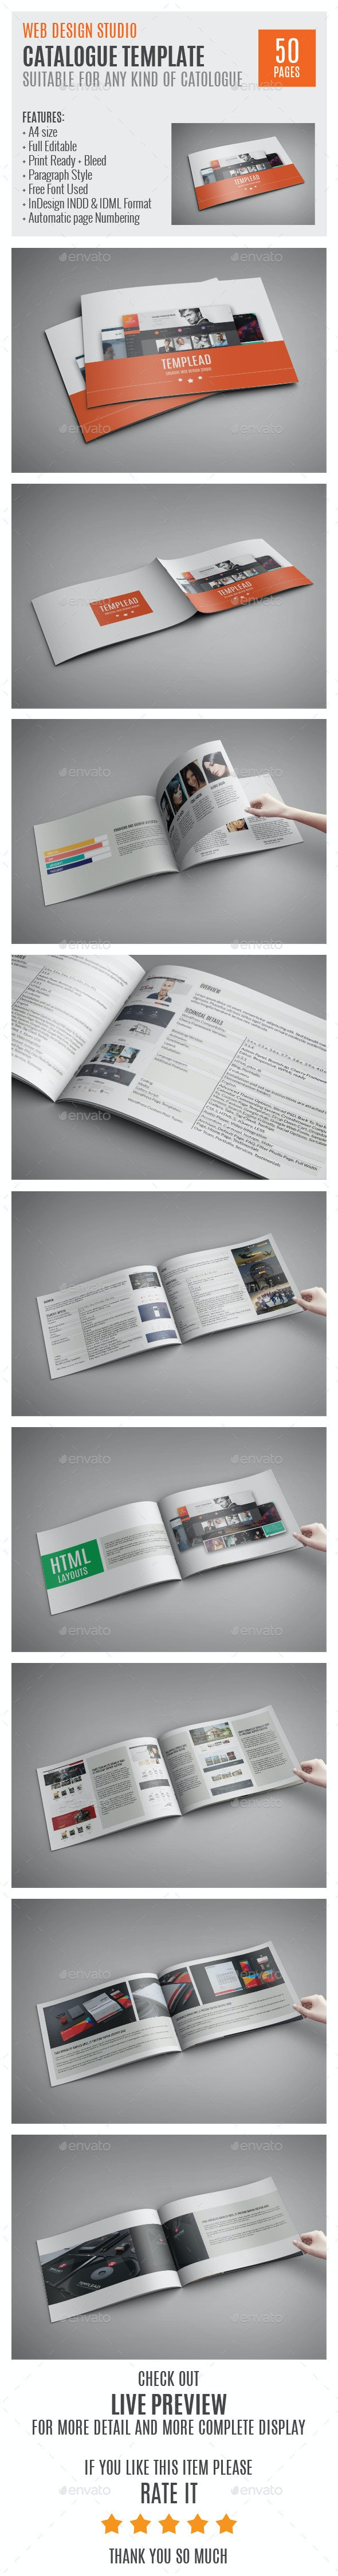 Web Design Studio InDesign Catalog 0004 - Catalogs Brochures